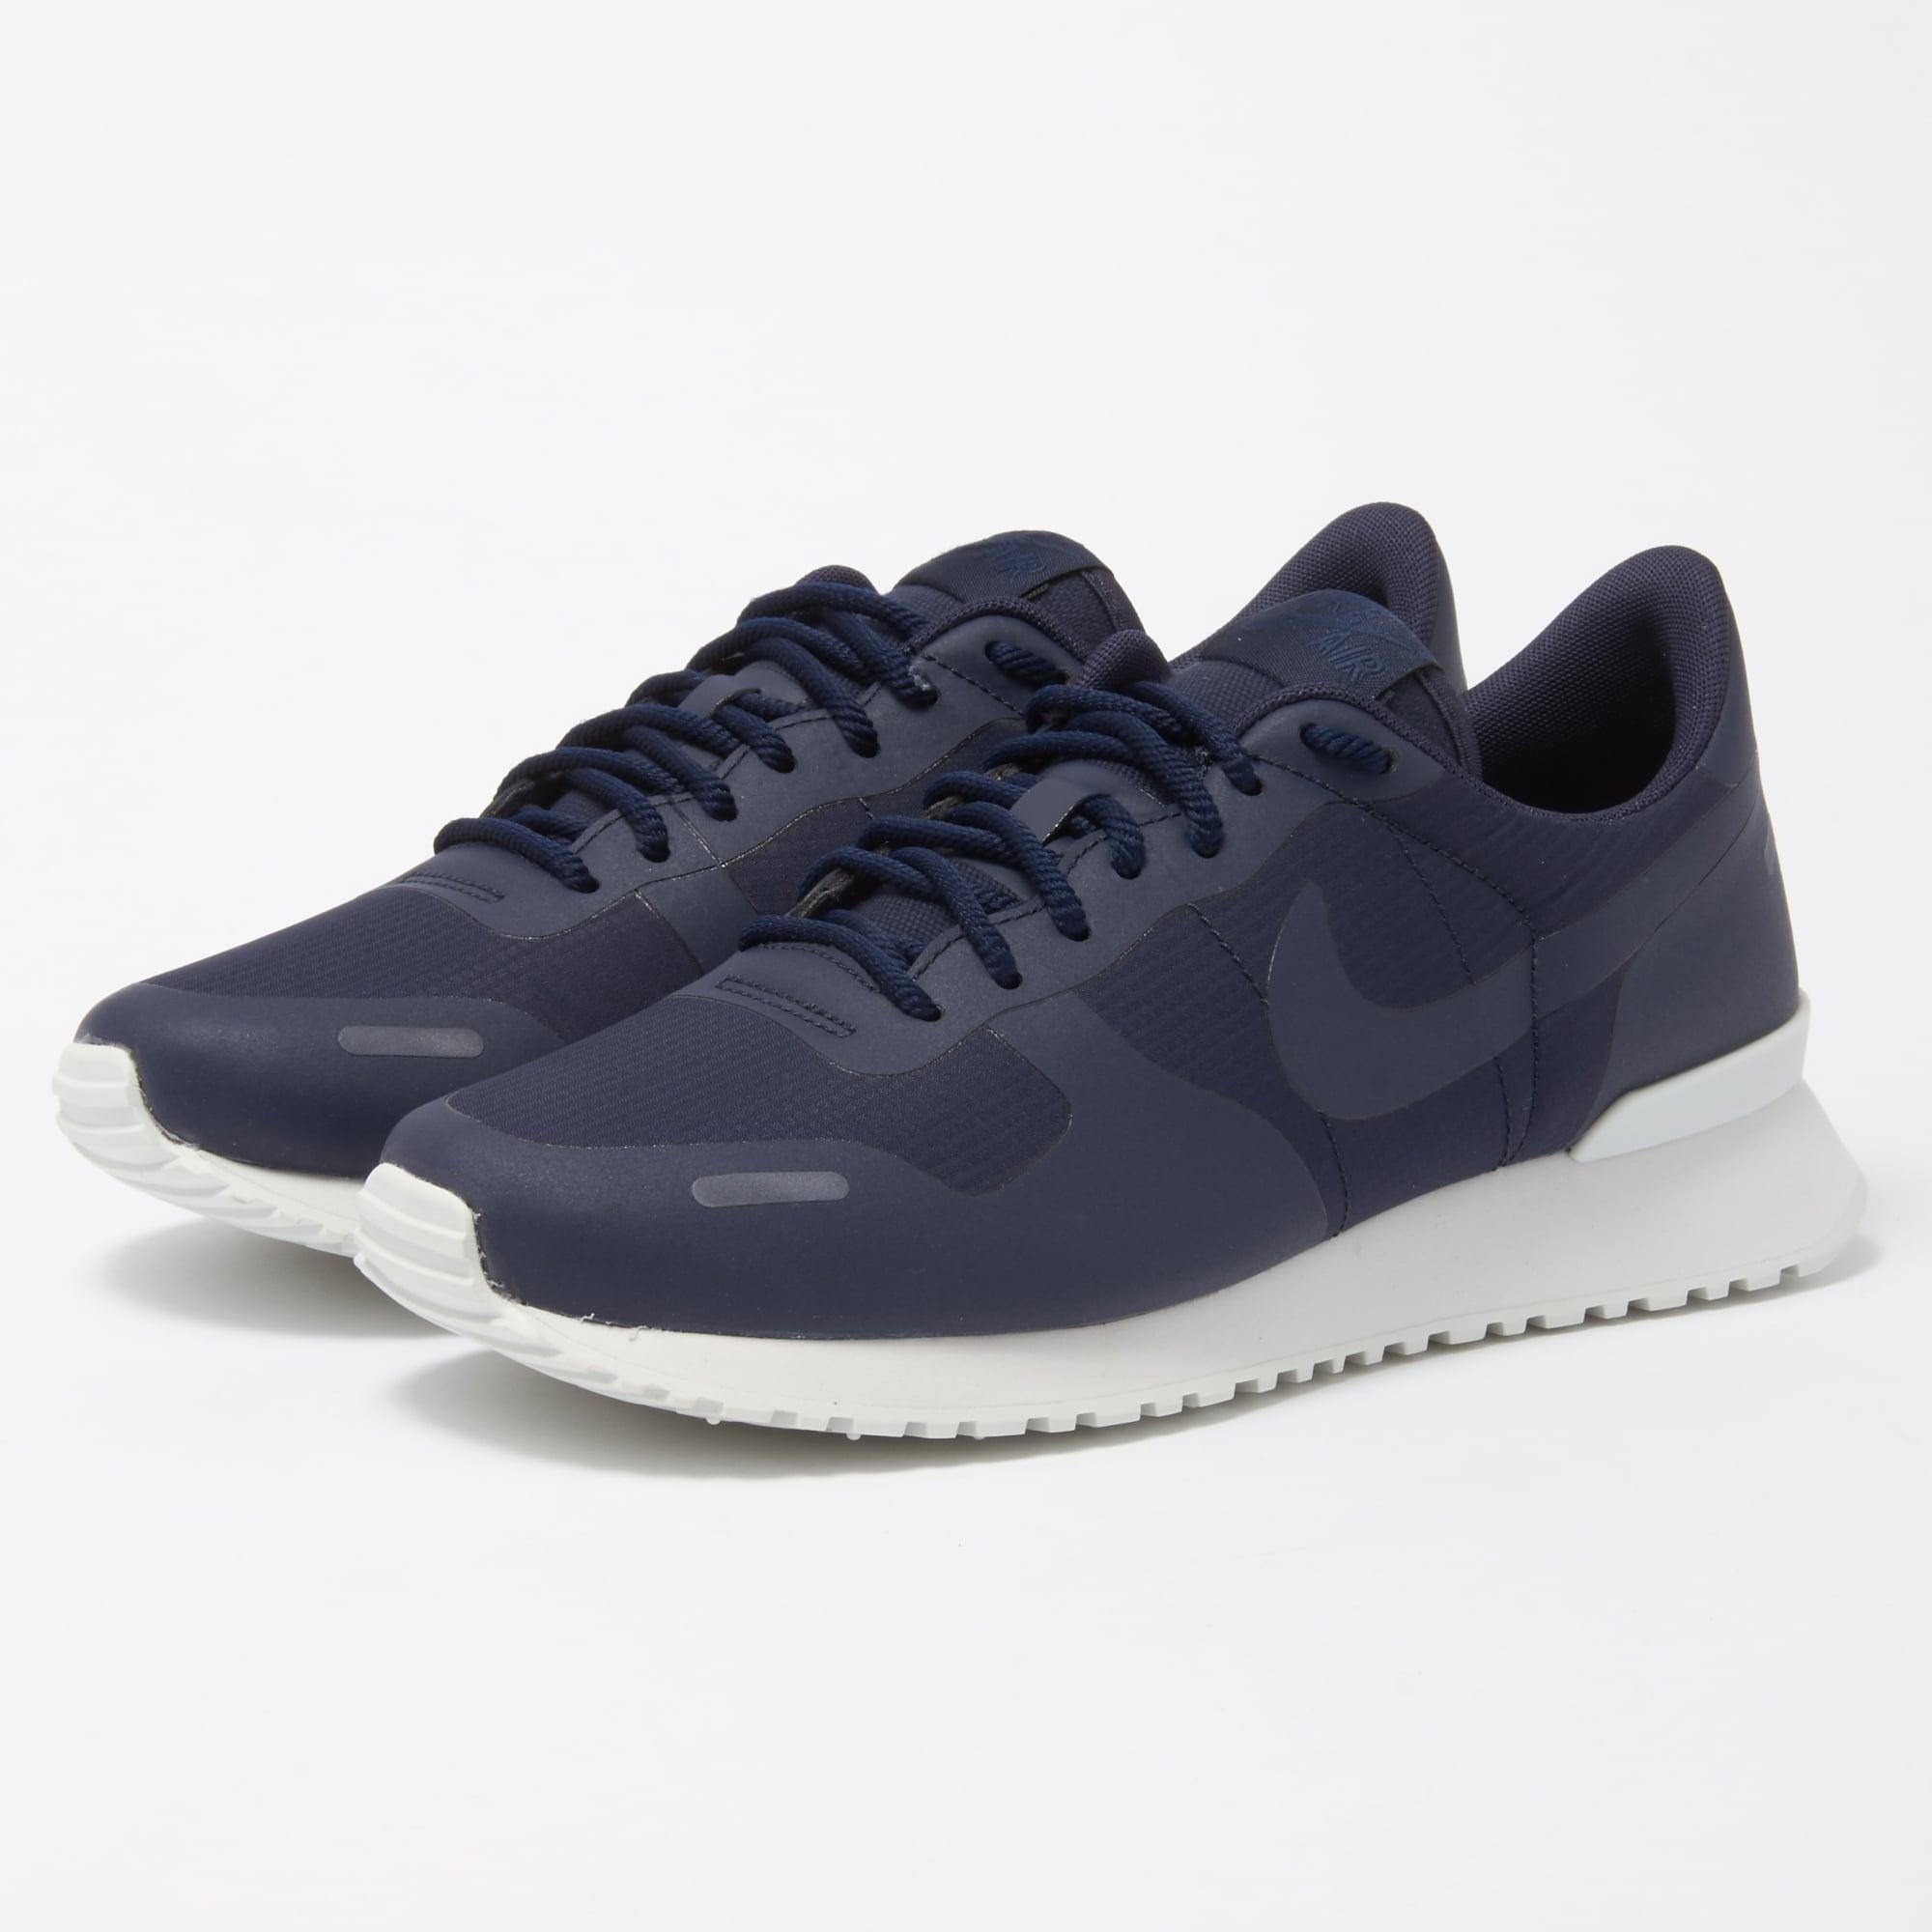 outlet store for sale Nike Air Vortex SE sneakers get authentic cheap online cheap sale big discount 1Qam7vju